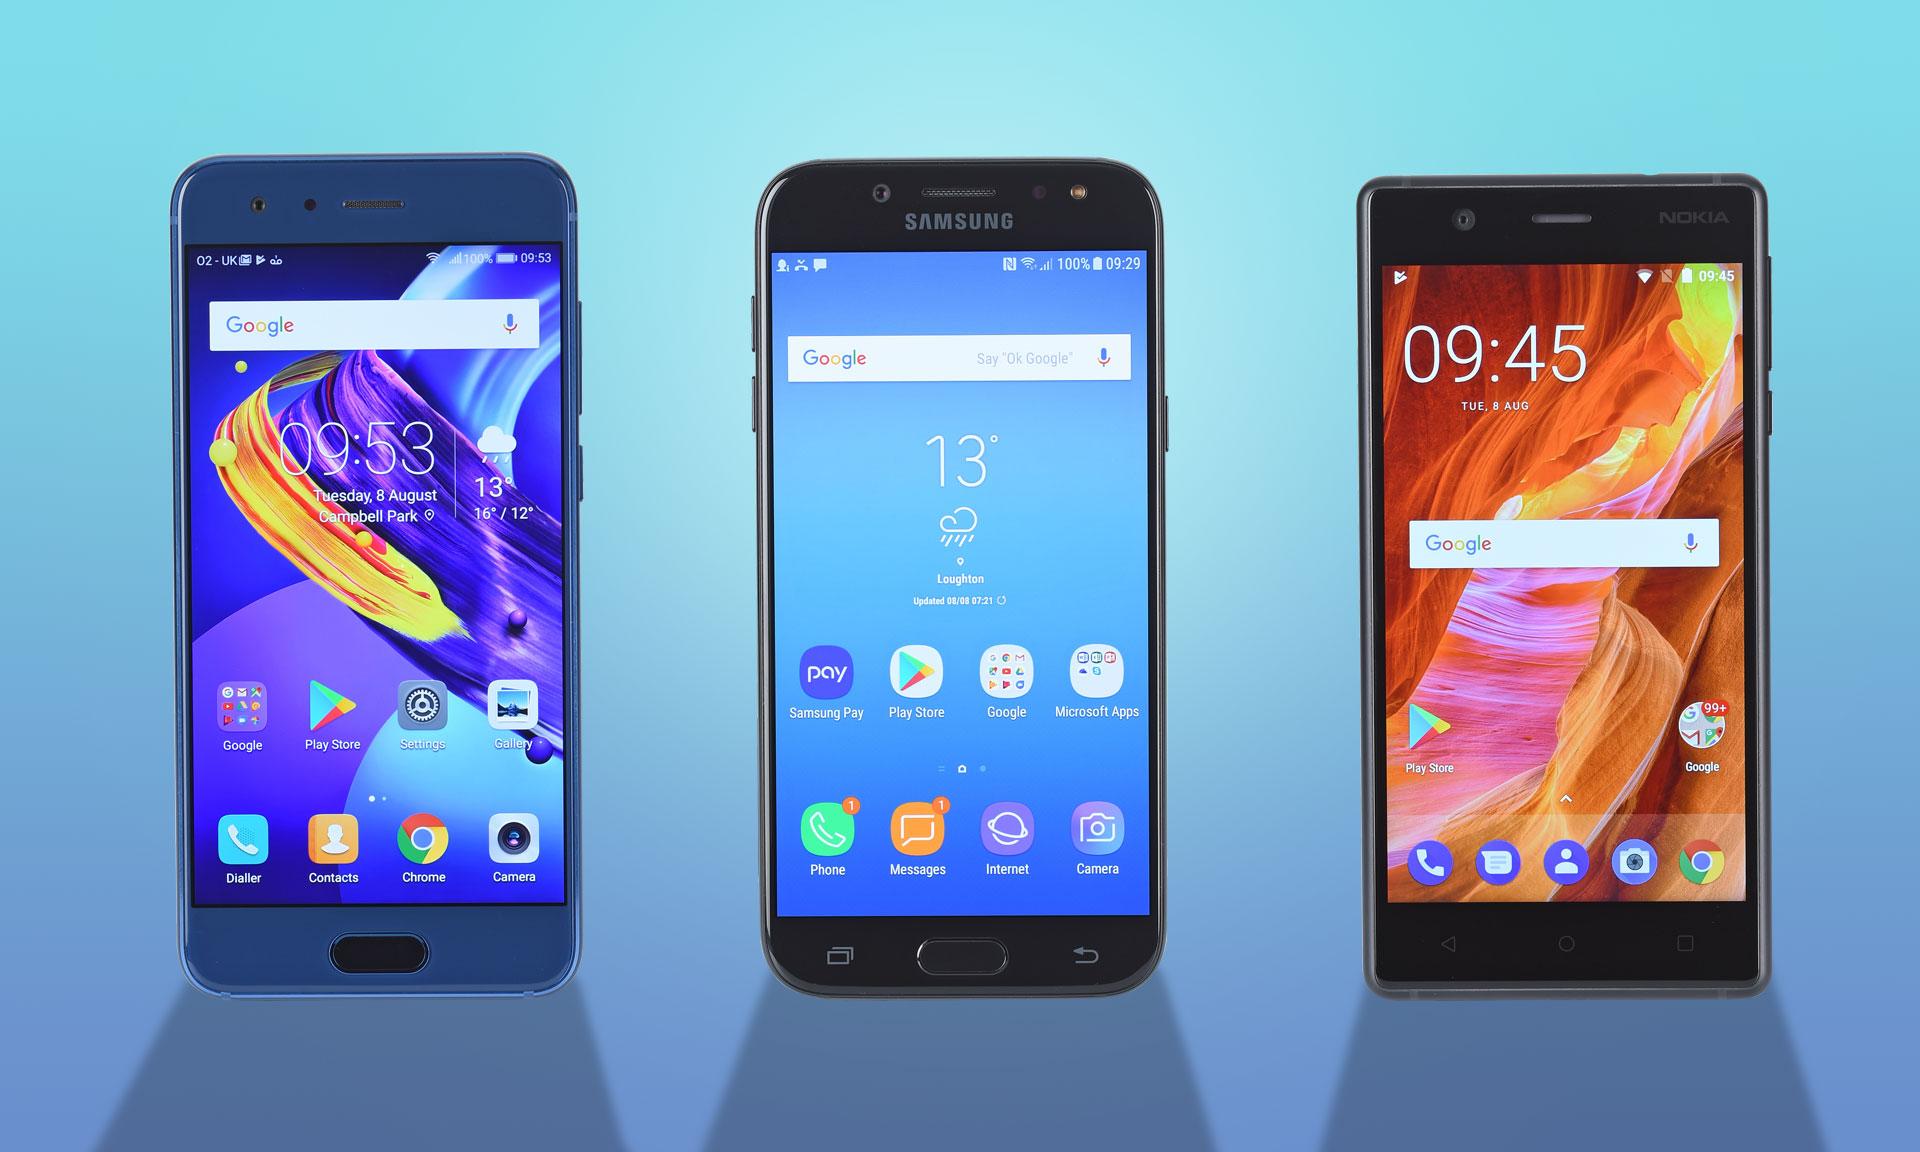 Mobile phone dating uk free cornwall dating